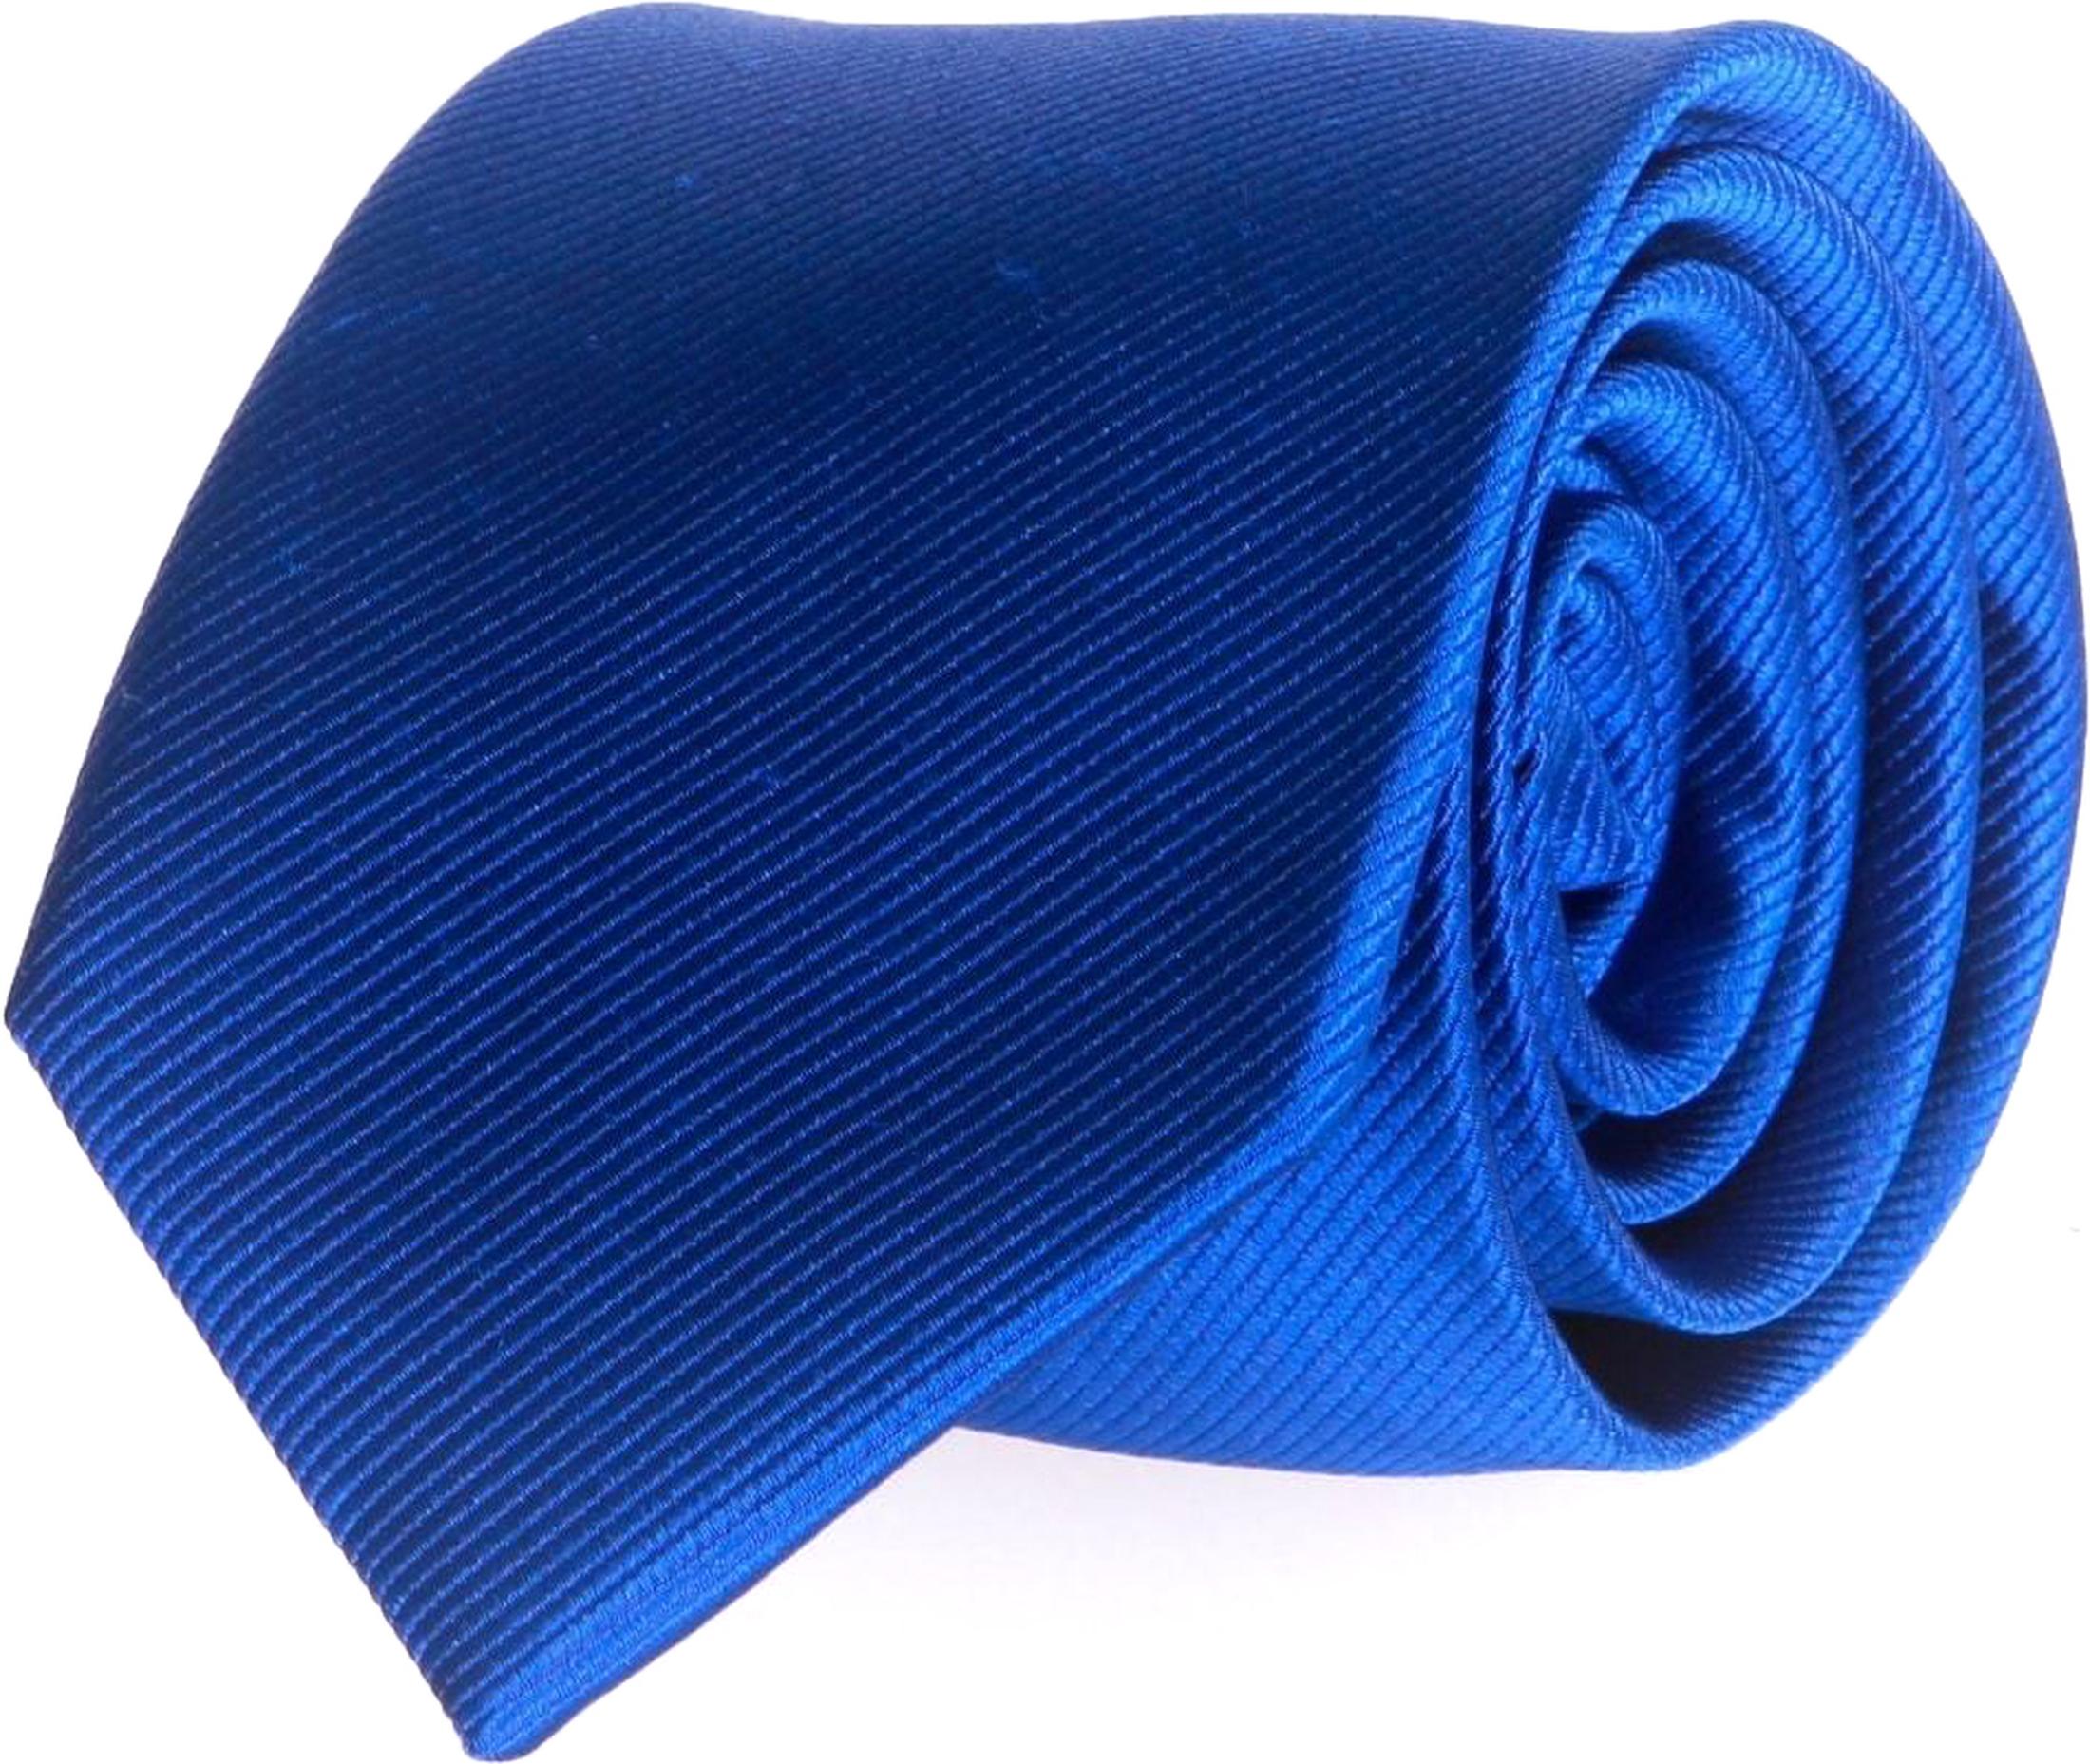 Krawatte Seide Kobaltblau Uni F65 foto 0